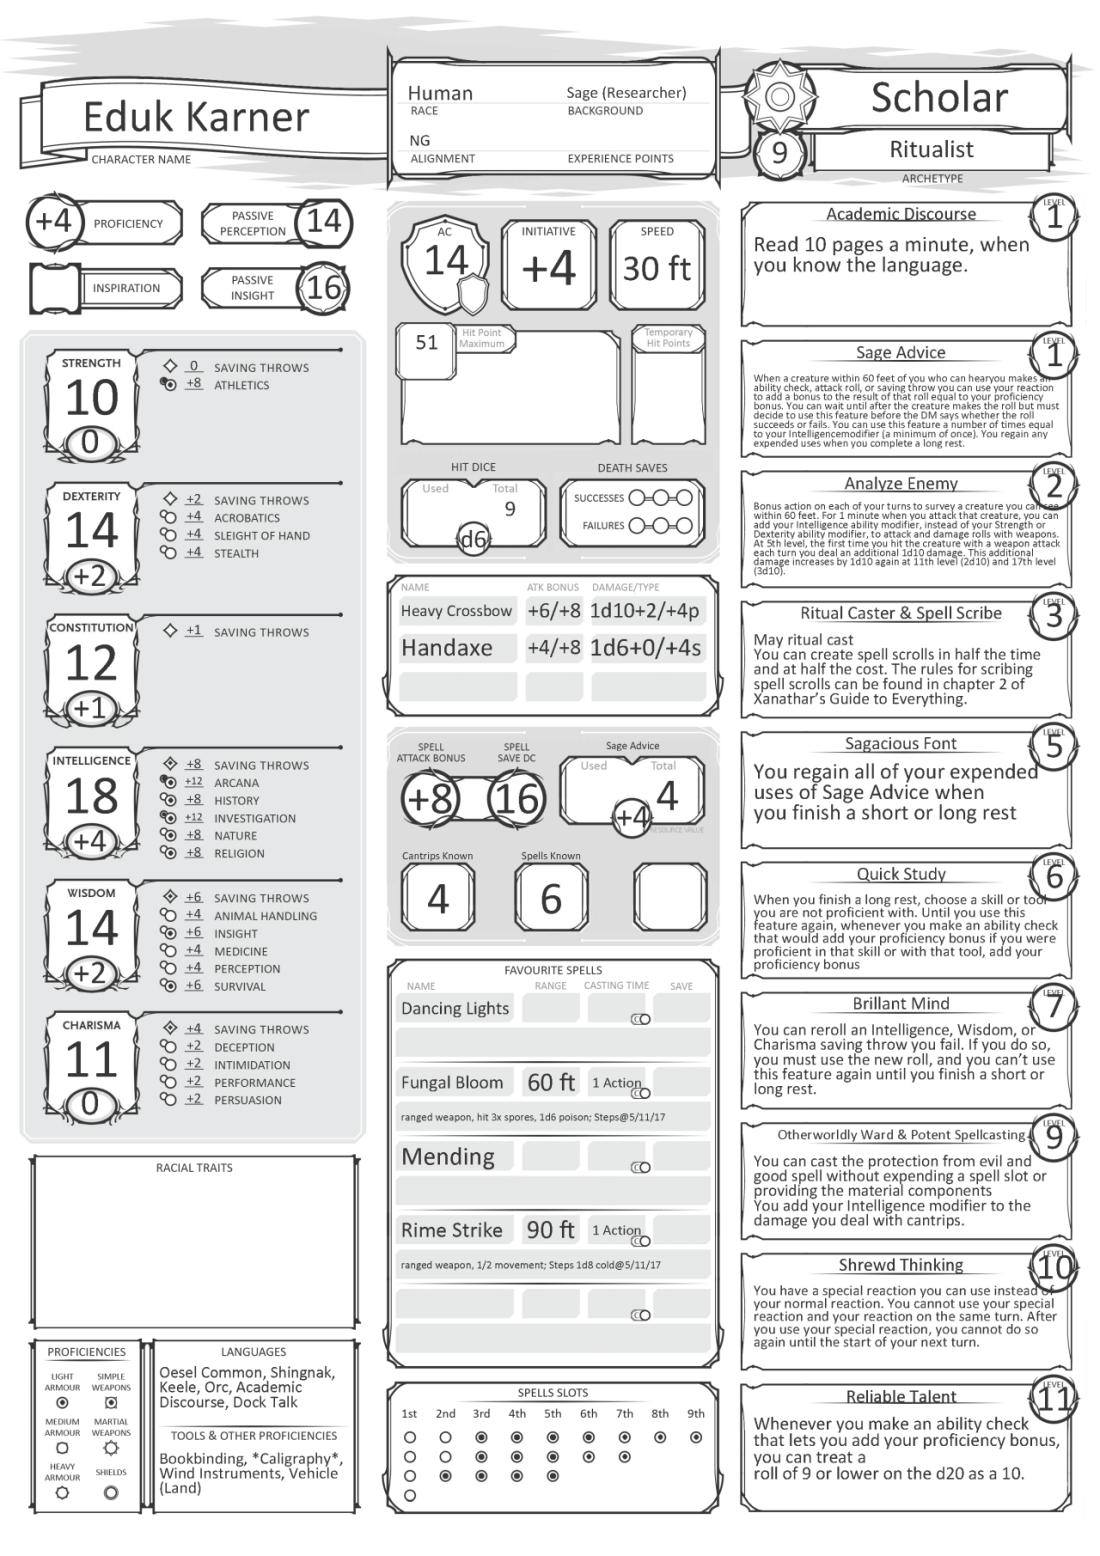 Eduk (scholar) v2_Page_1